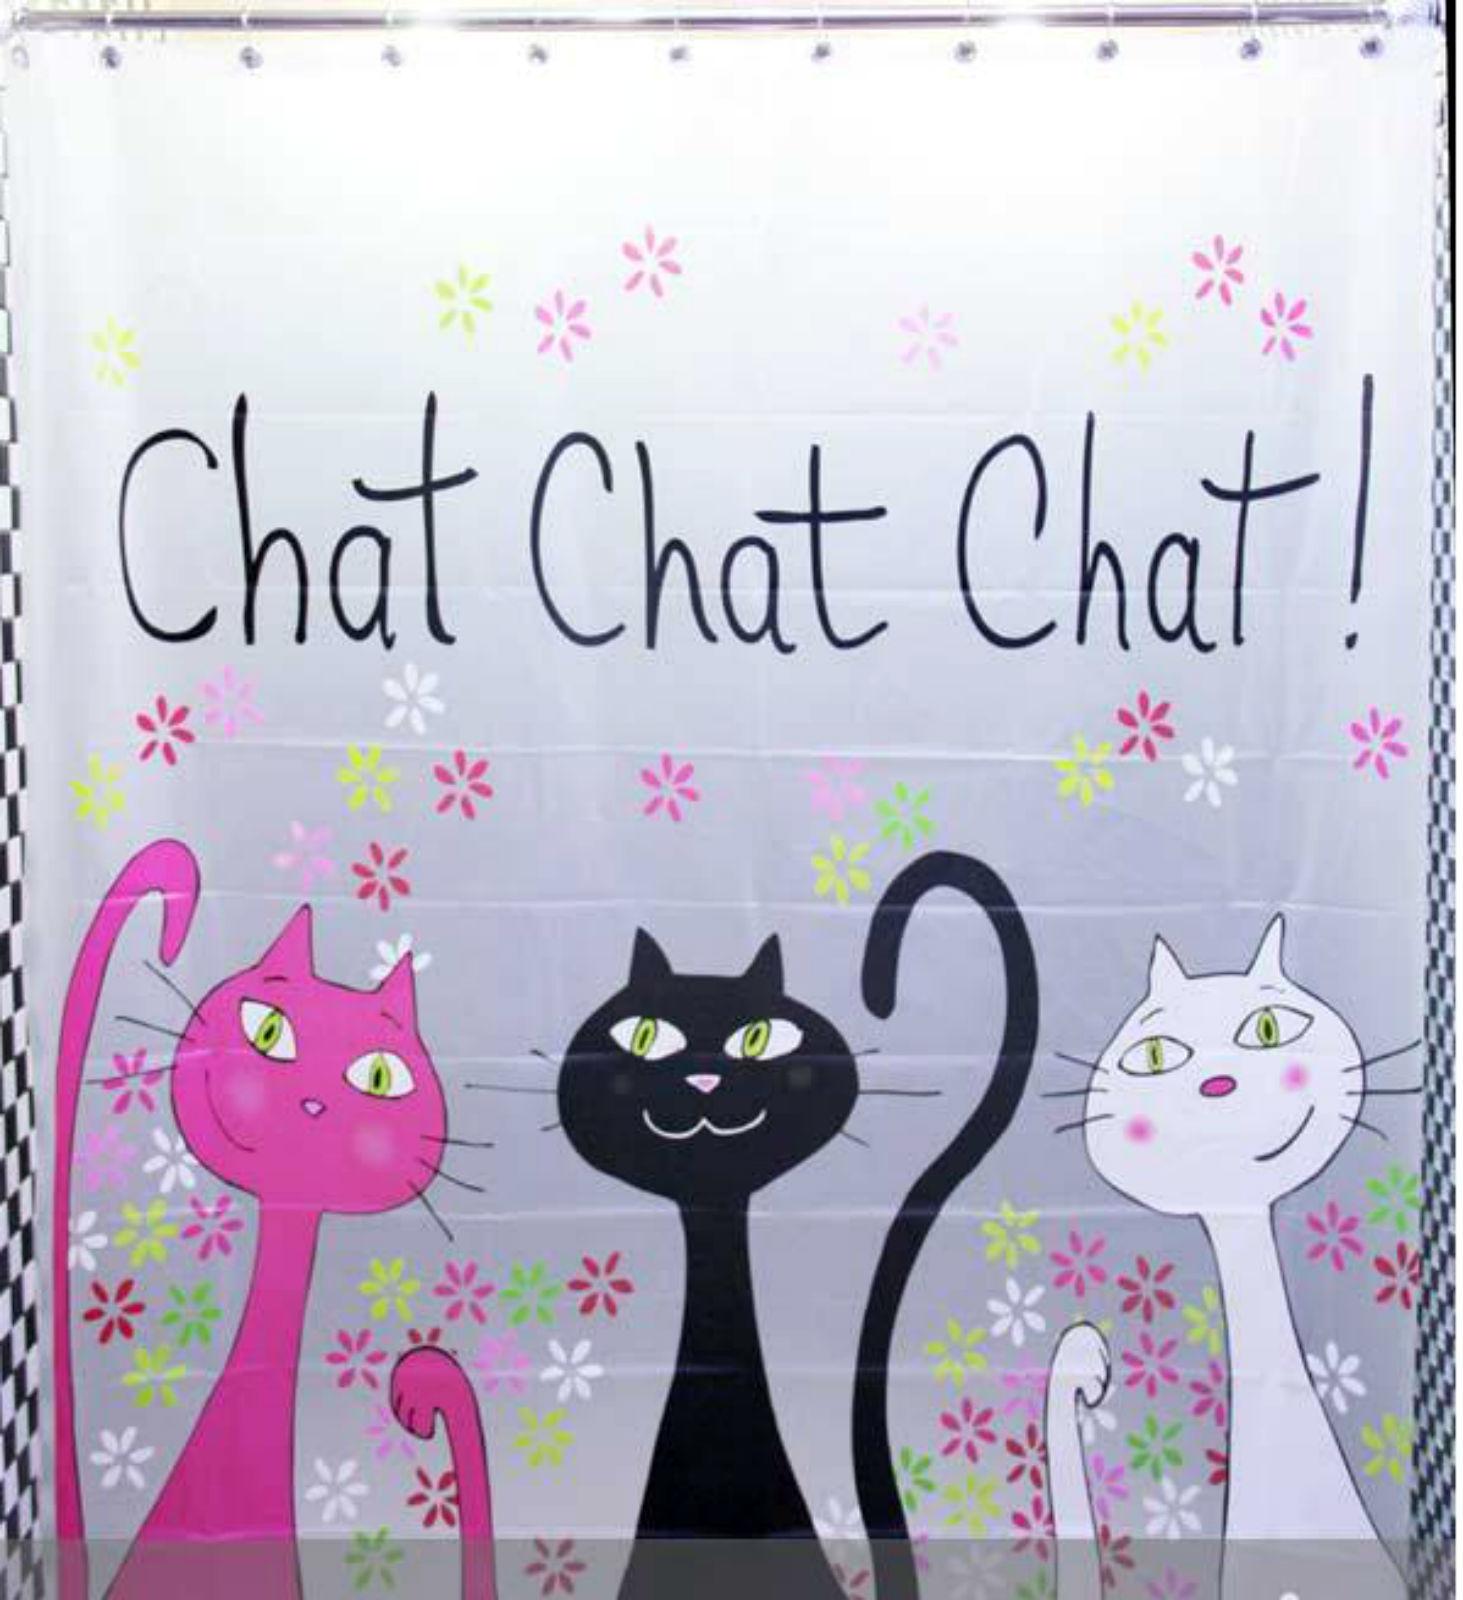 bath chatrooms Bath bathroom vanities showers bathtubs bathroom lighting faucets bathroom sinks tile bath accessories chatrooms chat rooms, chatrooms singles chat.